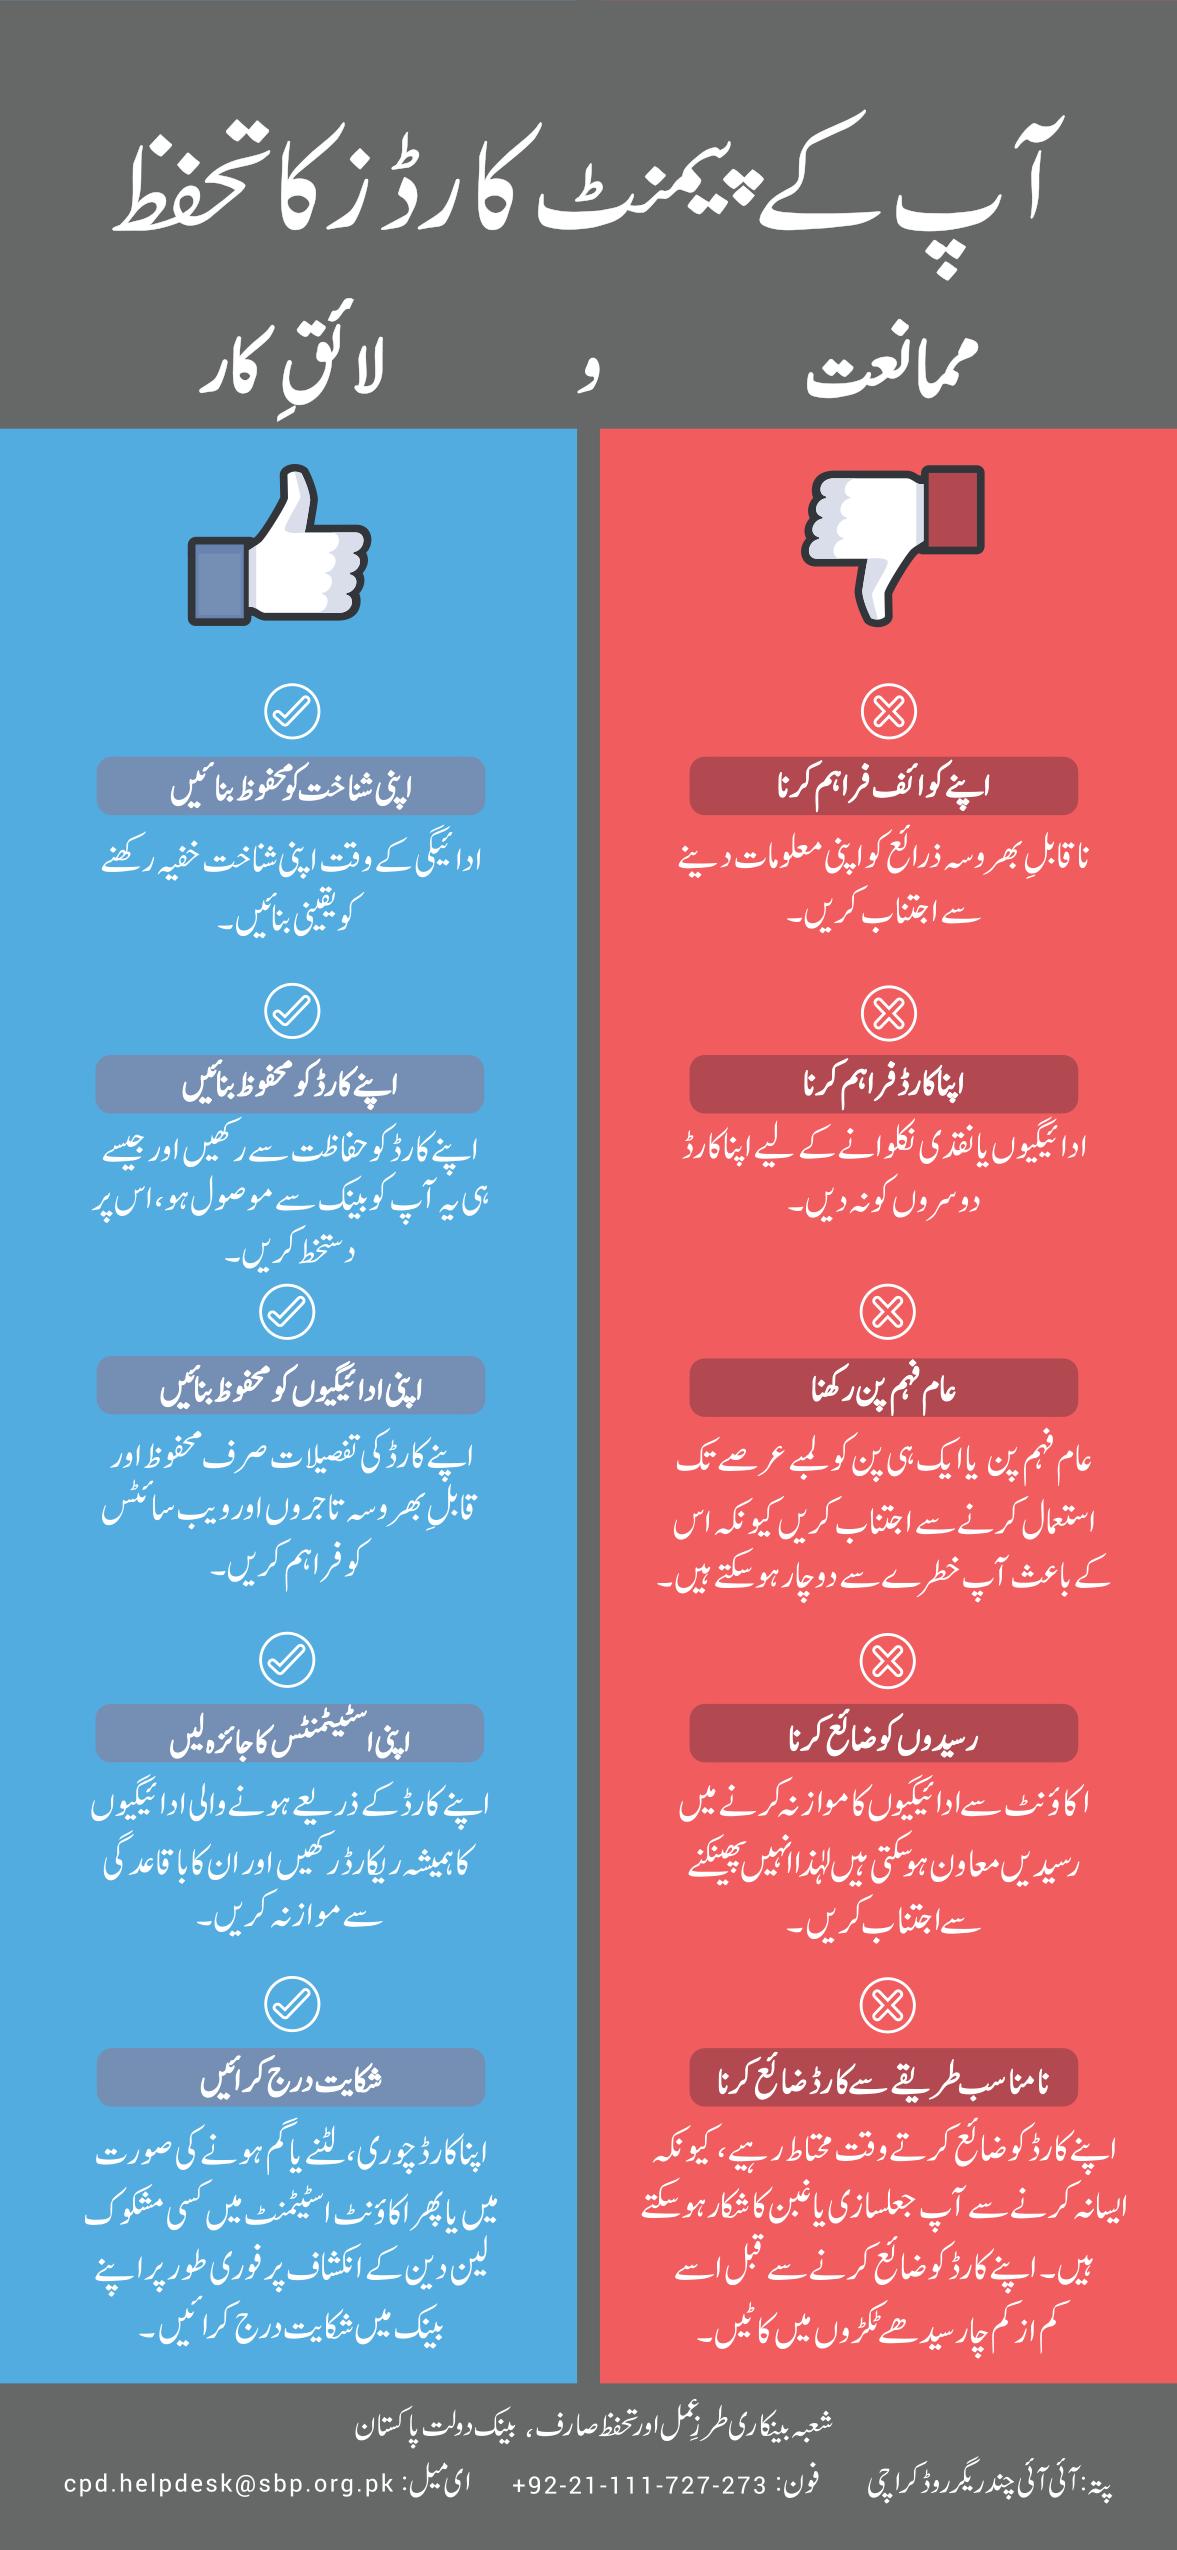 Meezan Bank | The Premier Islamic Bank